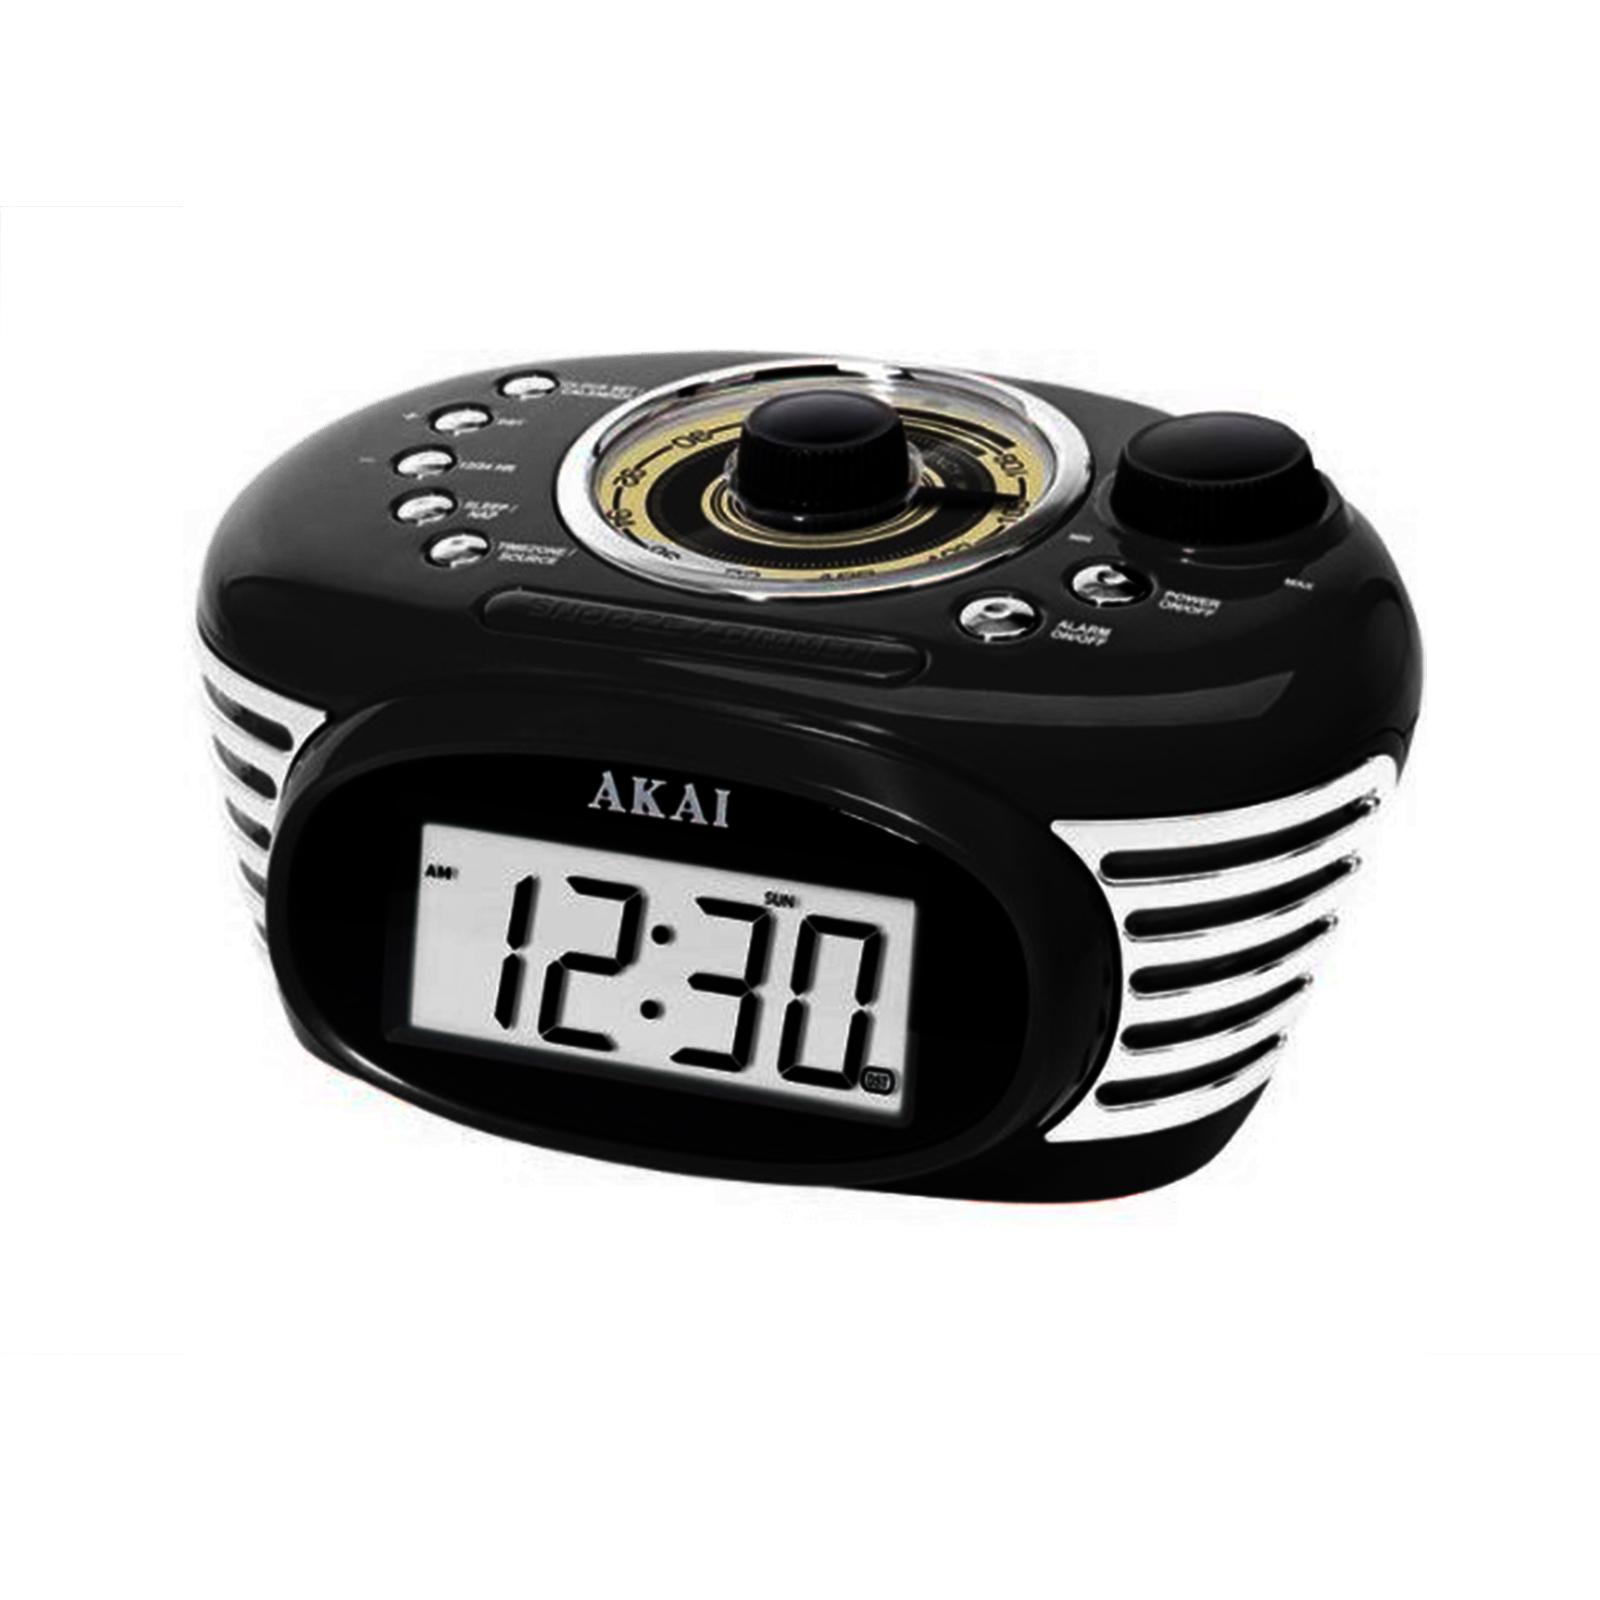 akai retro radio alarm digital backlight lcd display clock fm radio w jack ebay. Black Bedroom Furniture Sets. Home Design Ideas